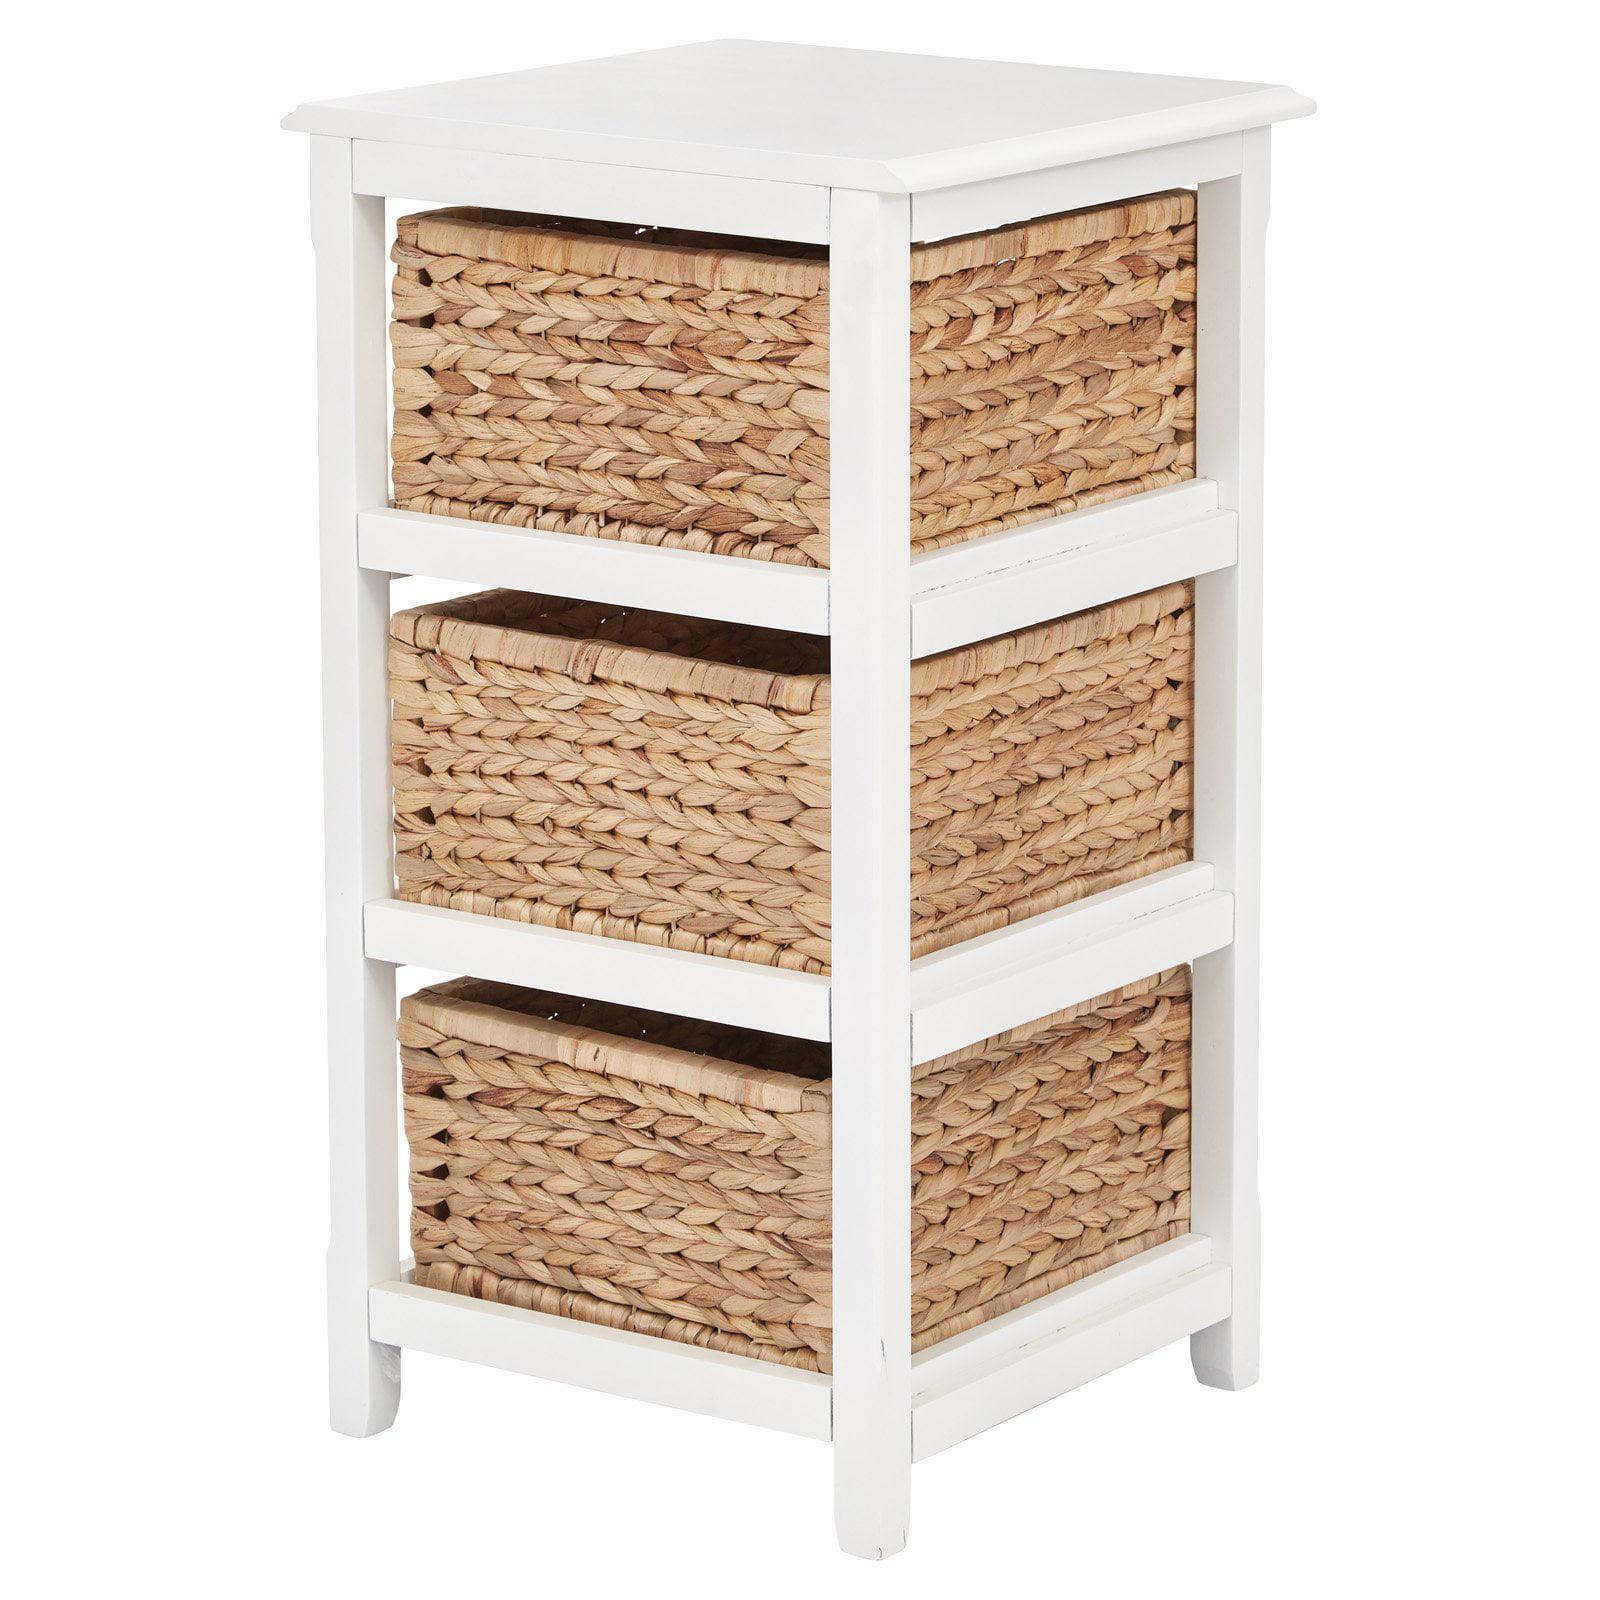 Osp Home Furnishings Seabrook Three Tier Storage Unit With White Finish And Natural Baskets Walmart Com Walmart Com